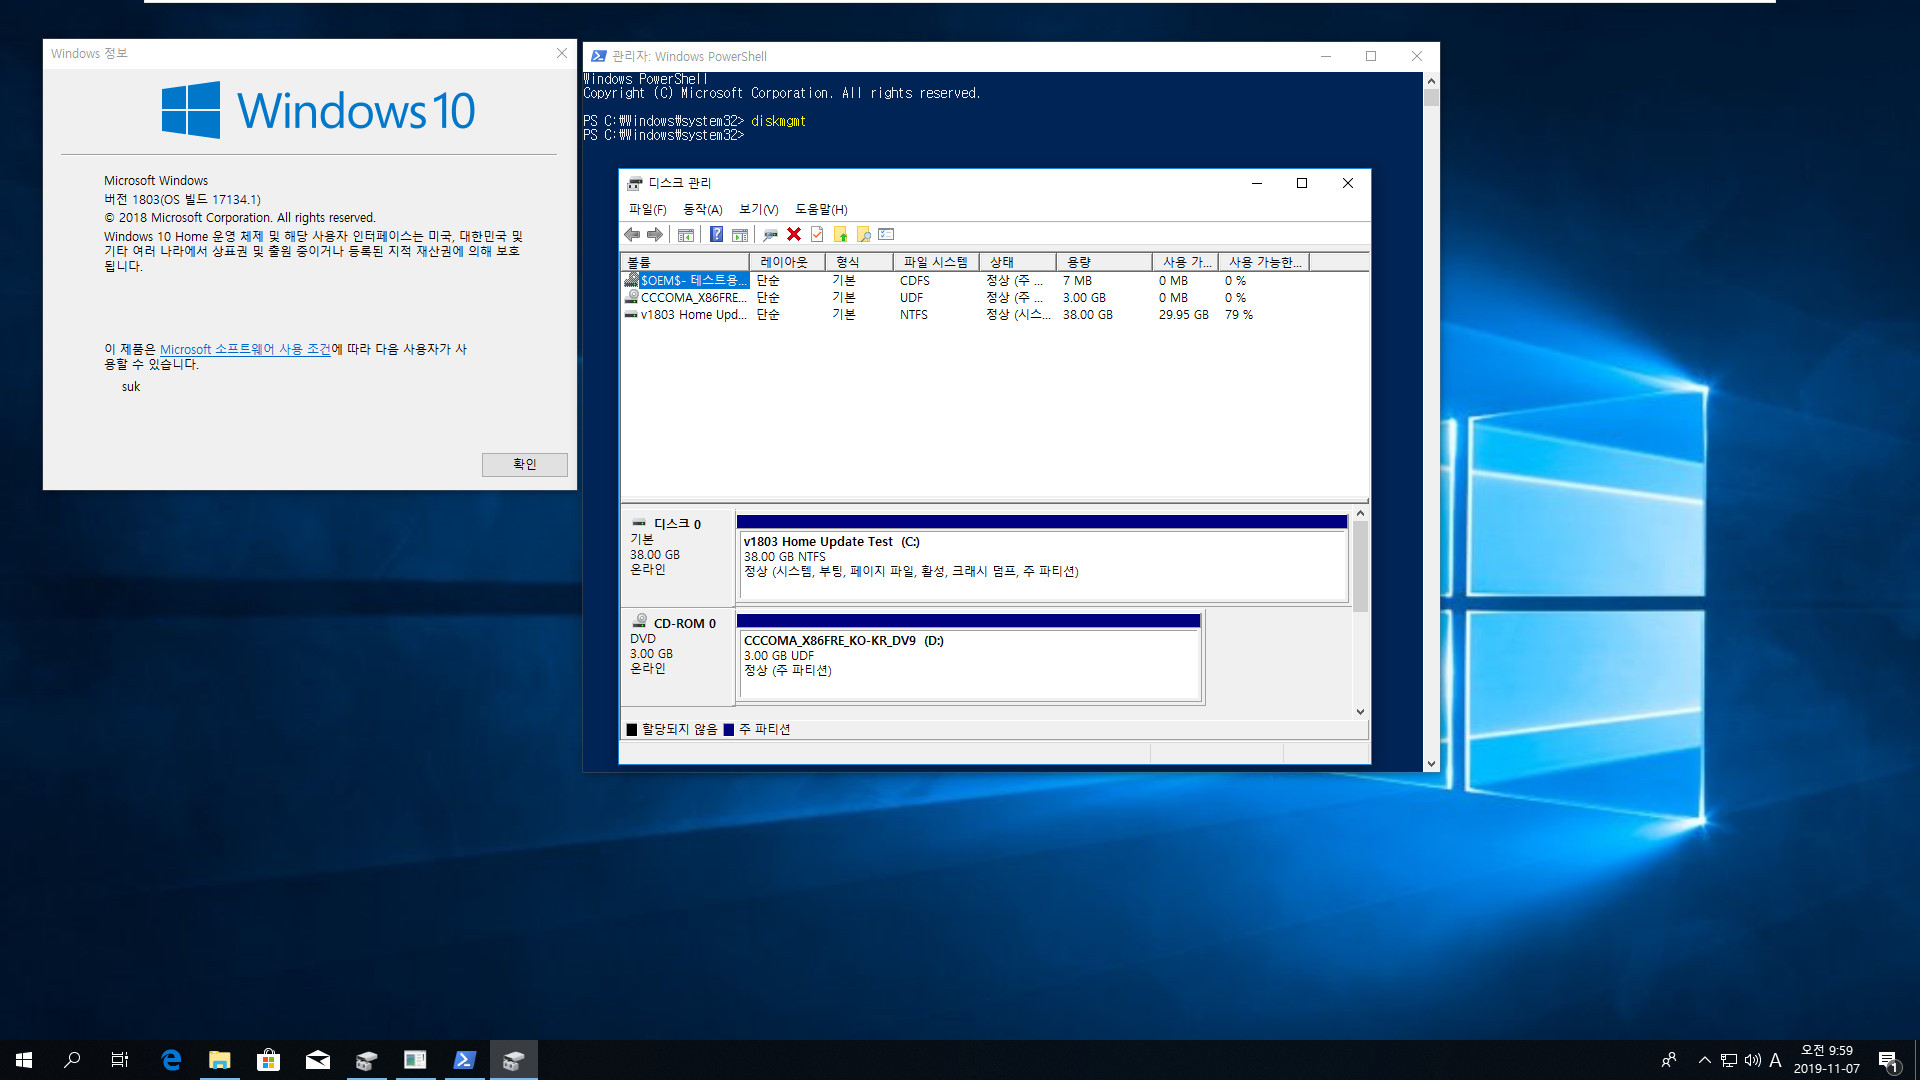 Windows 10 업데이트 방지하기 [업데이트 다운로드 폴더 사용 금지].bat 테스트 - 버전 1803, Home 에서 버전 1903 기능 업데이트 방지하기 - 적용 후에 컴퓨터 관리 불가 상태 해결 방법 - 먼저 관리자 권한으로 diskpart [디스크관리] 실행해주시면 다른 것도 마우스로 실행됩니다 2019-11-07_095917.jpg